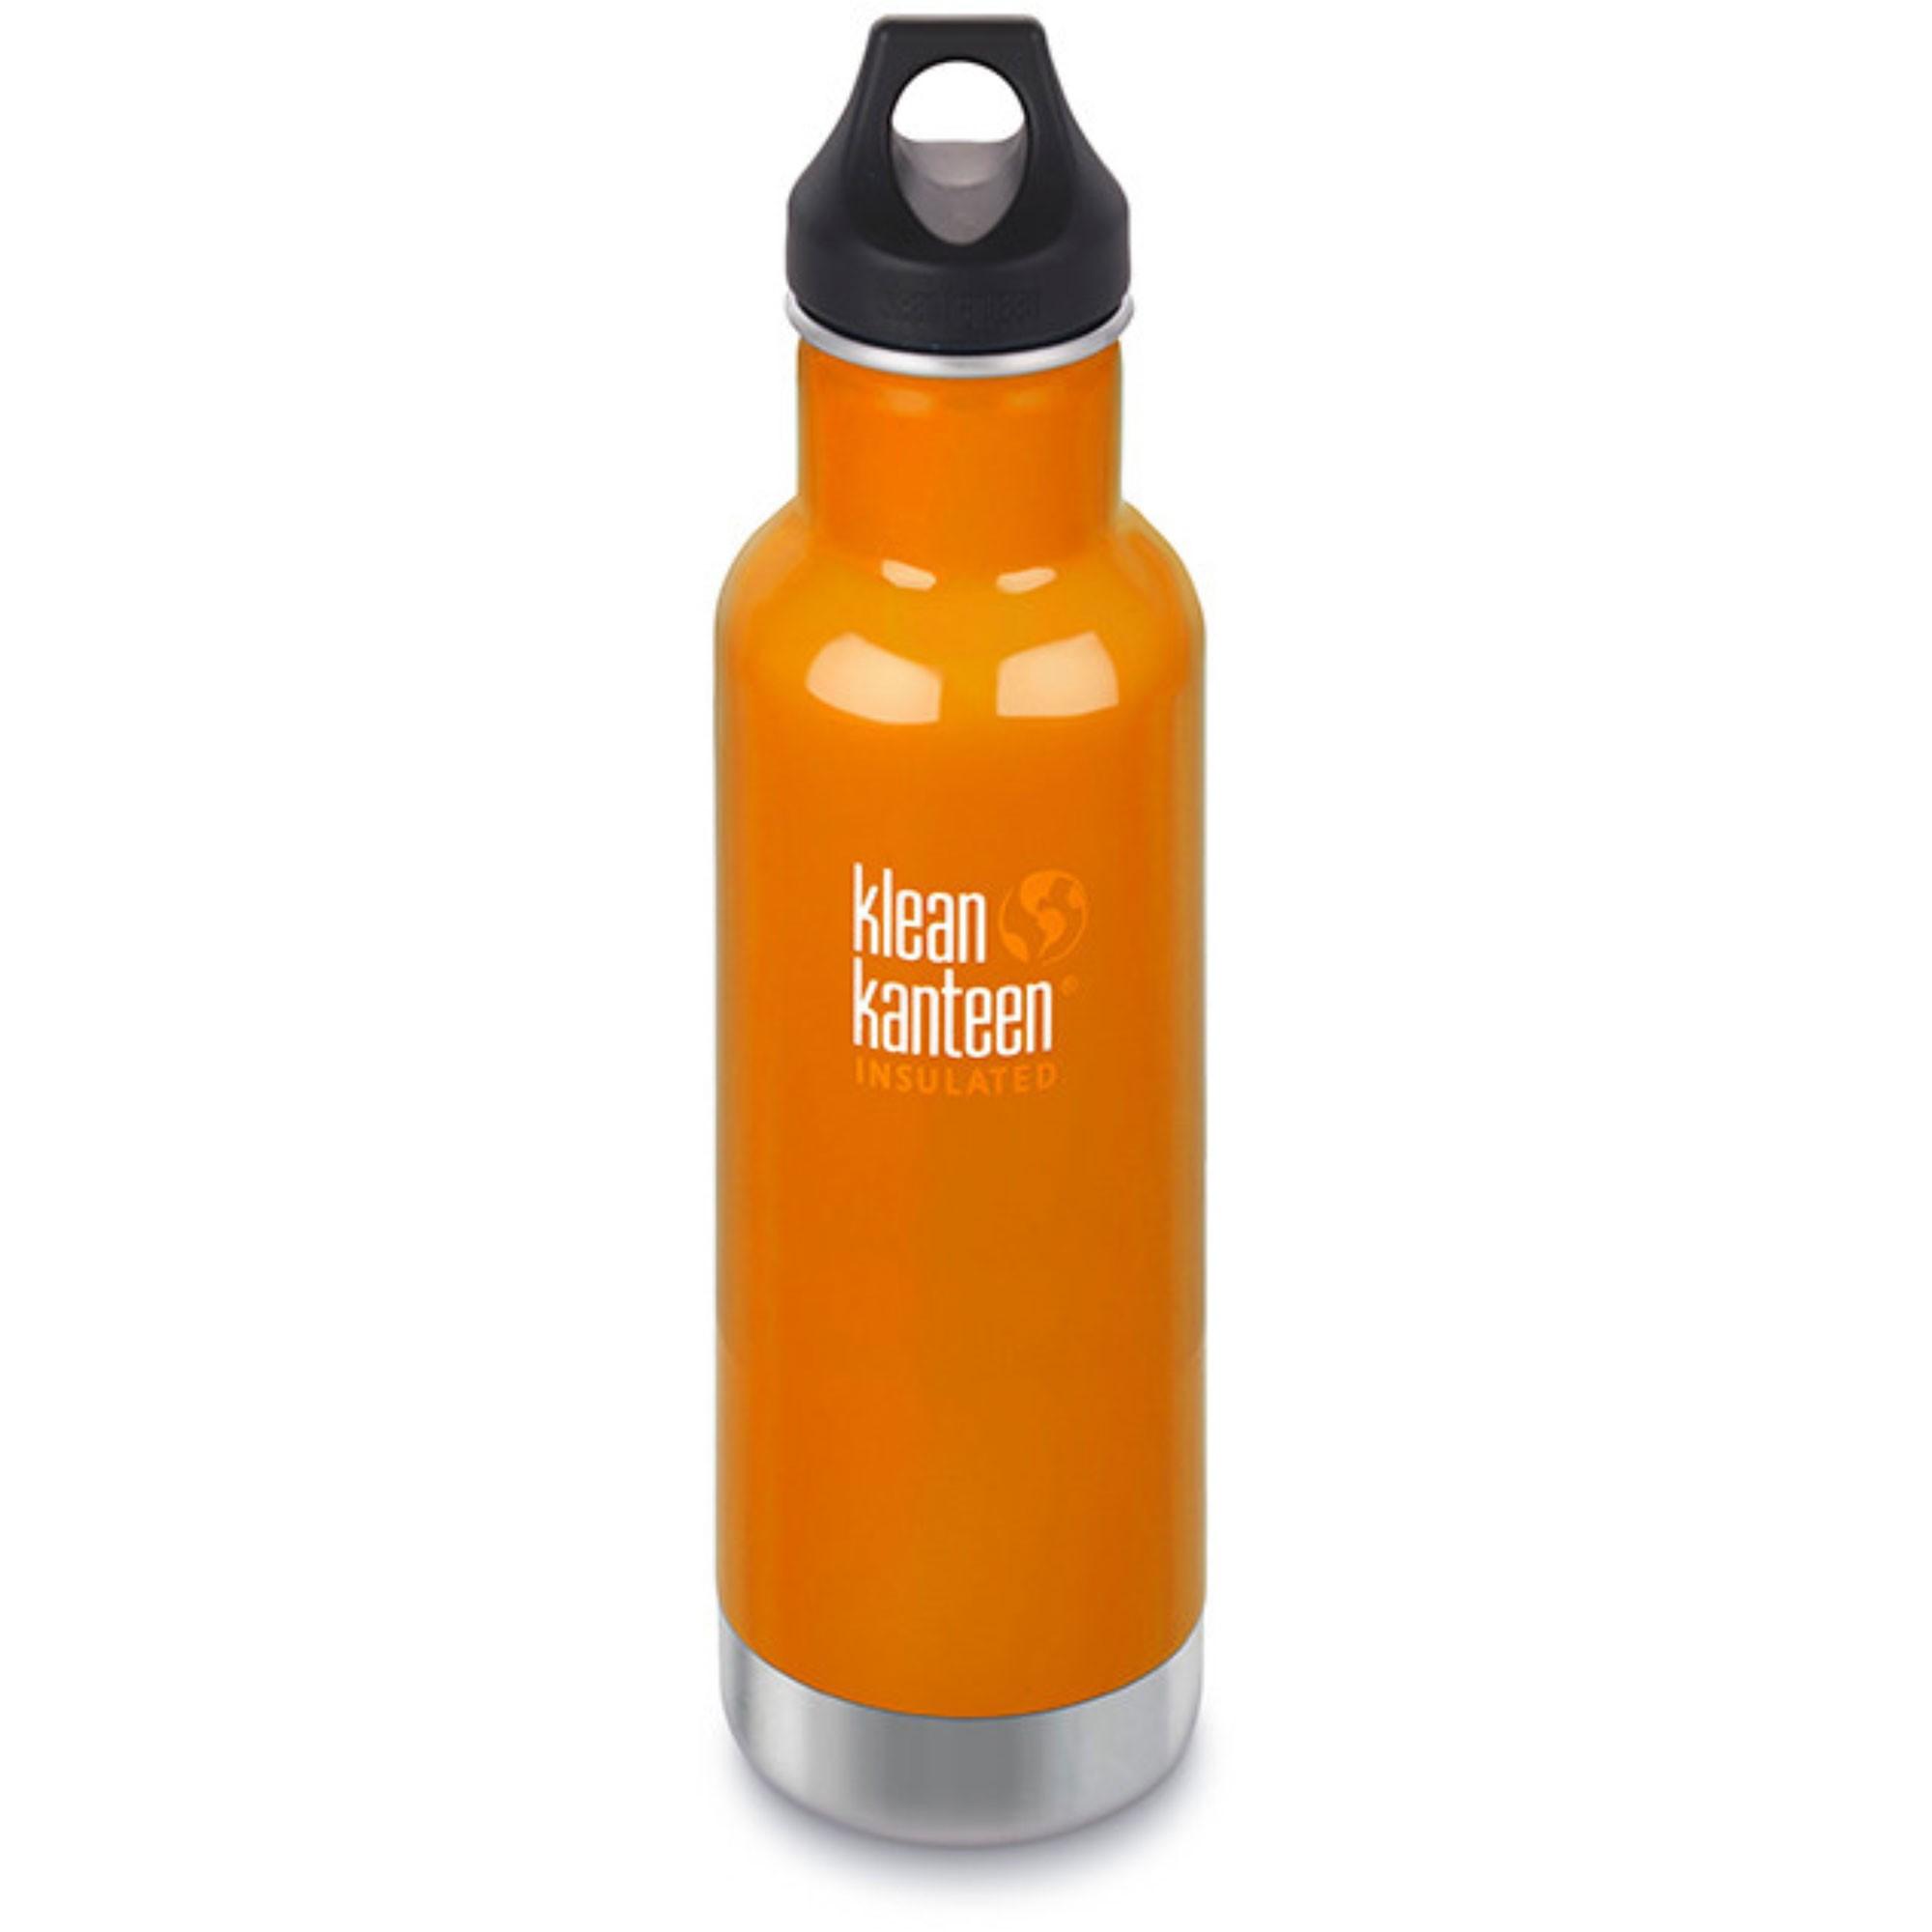 KLEAN KANTEEN - Classic Insulated Flask - 592ml - Canyon Orange